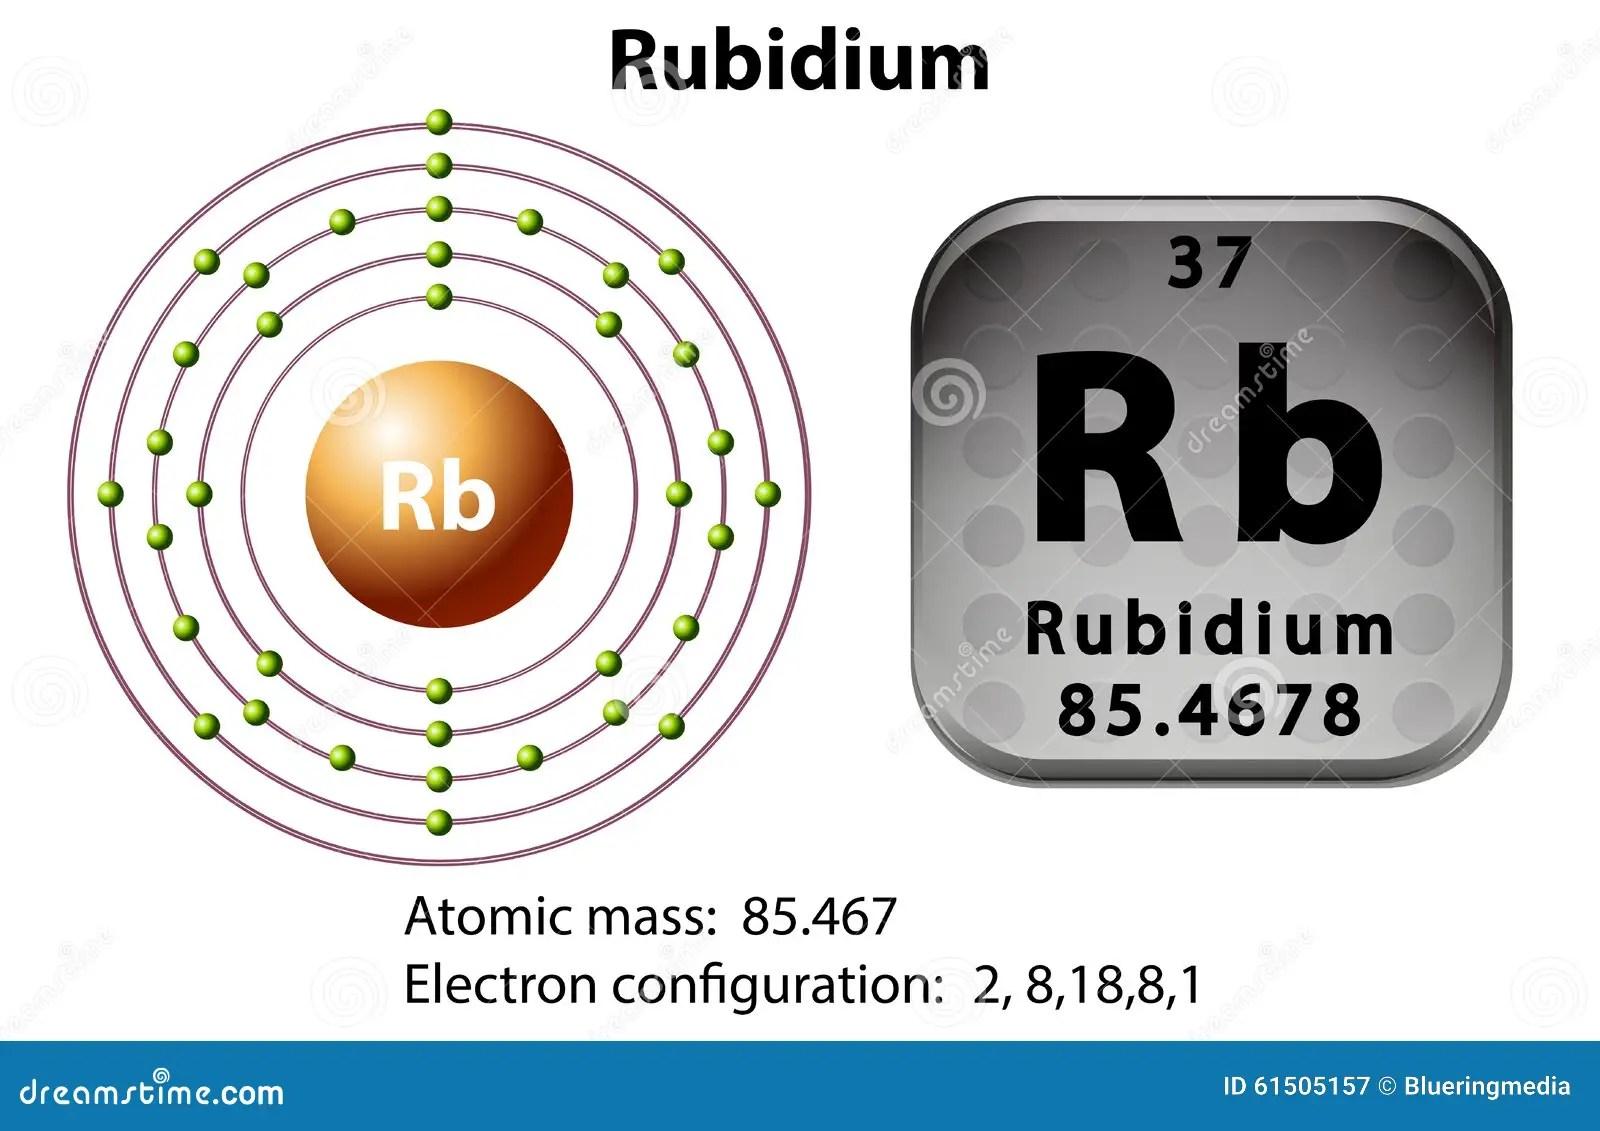 bohr diagram for all elements razor e300 wiring symbol and electron rubidium stock vector - image: 61505157